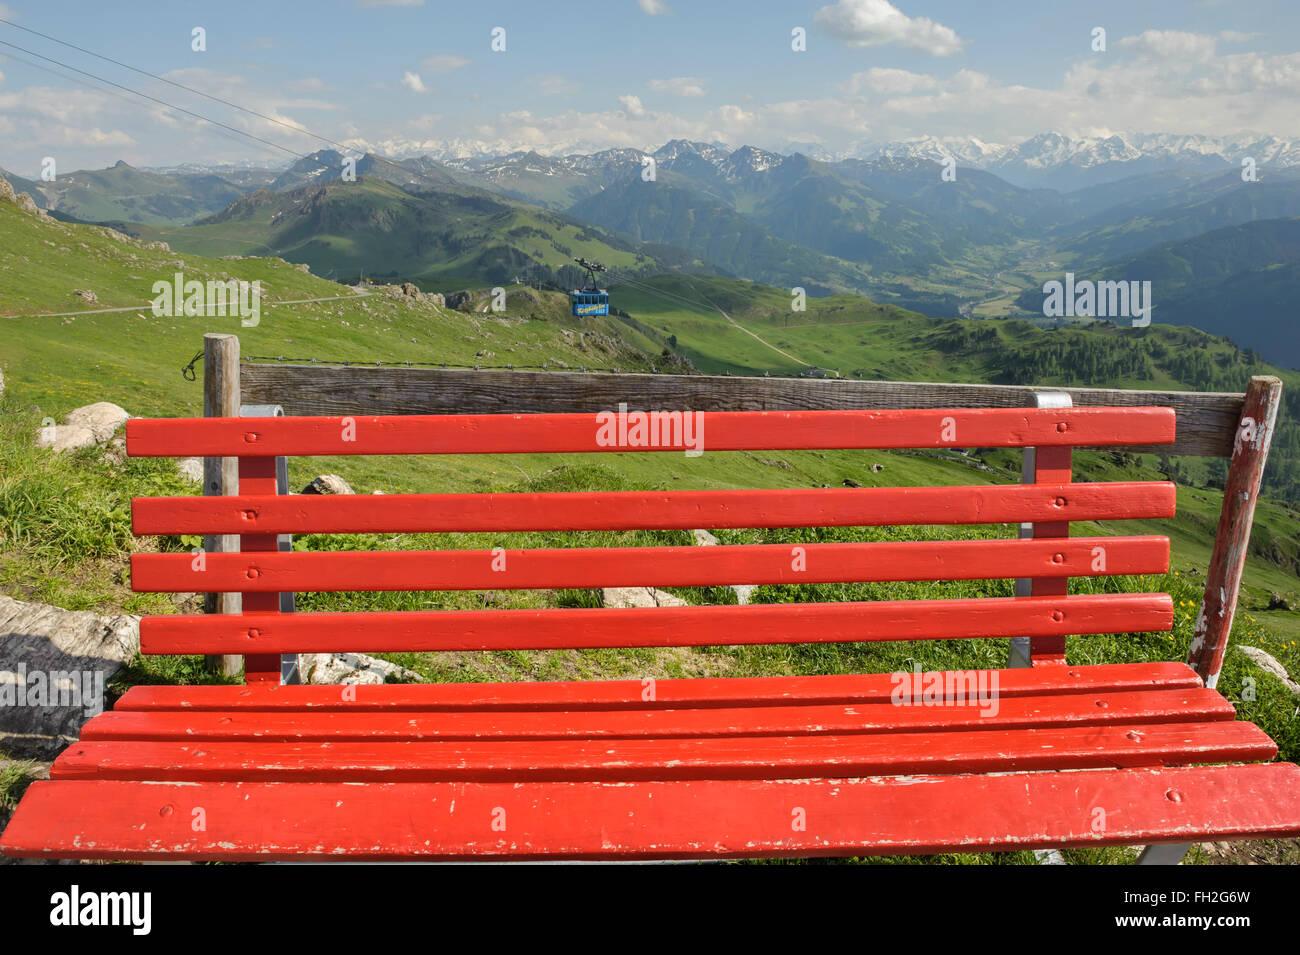 Cable car at Kitzbüheler Horn Alps Kitzbühel. Austria. Europe - Stock Image